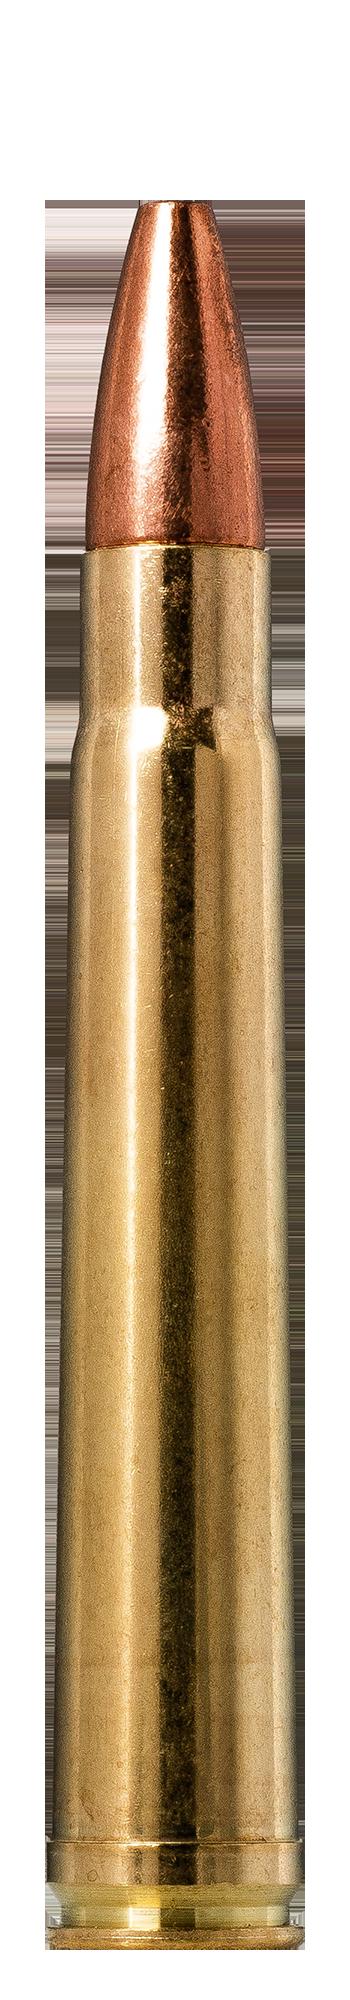 375 H/&H Magnum Snap Caps .375 H/&H Mag Fake Holland /& Holland